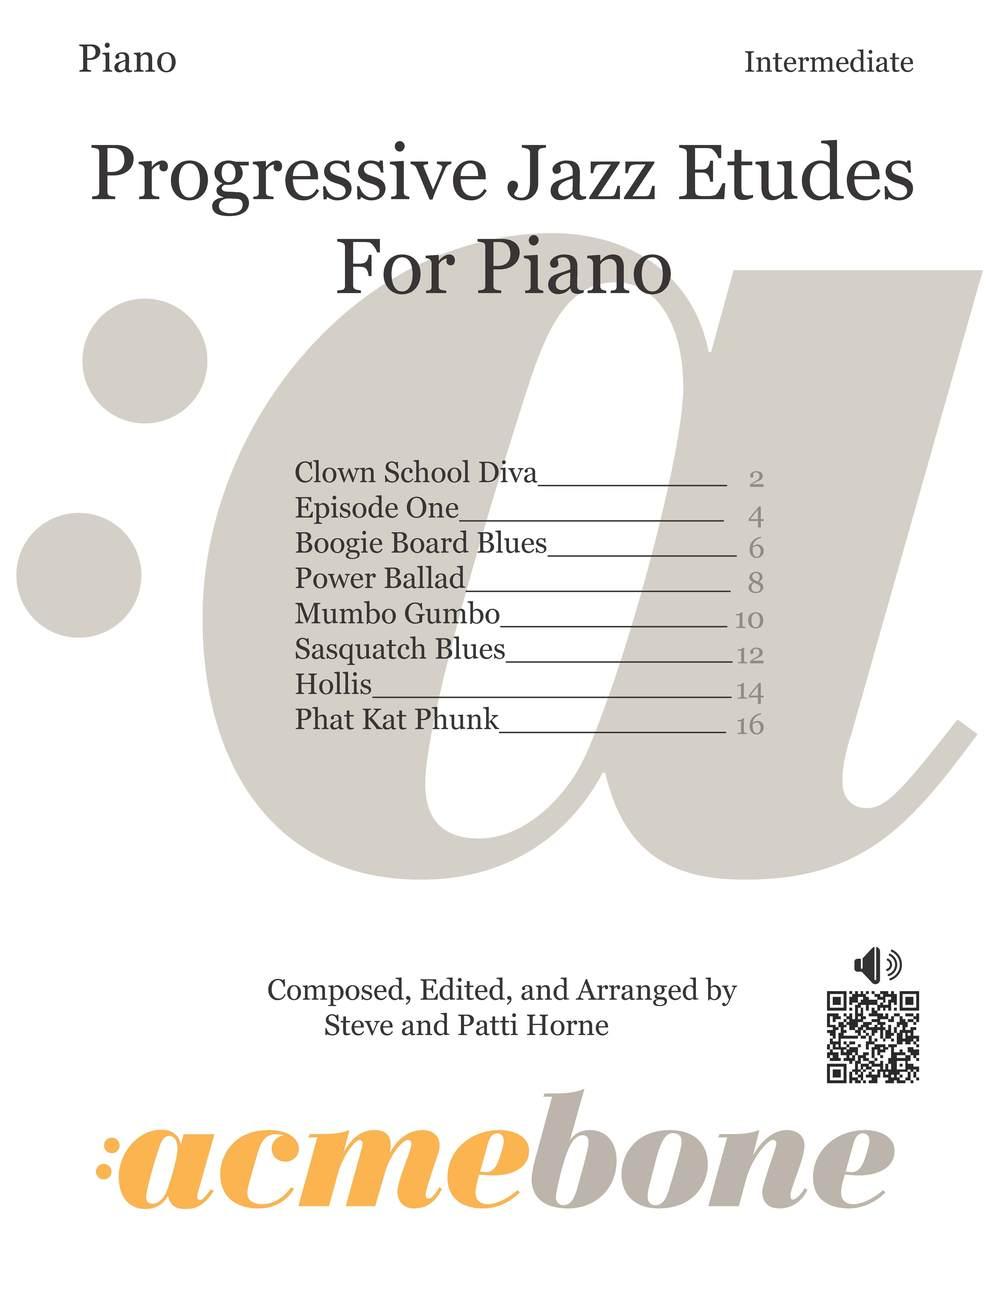 Piano Etudes_index_bk2_w-qr-code.jpg